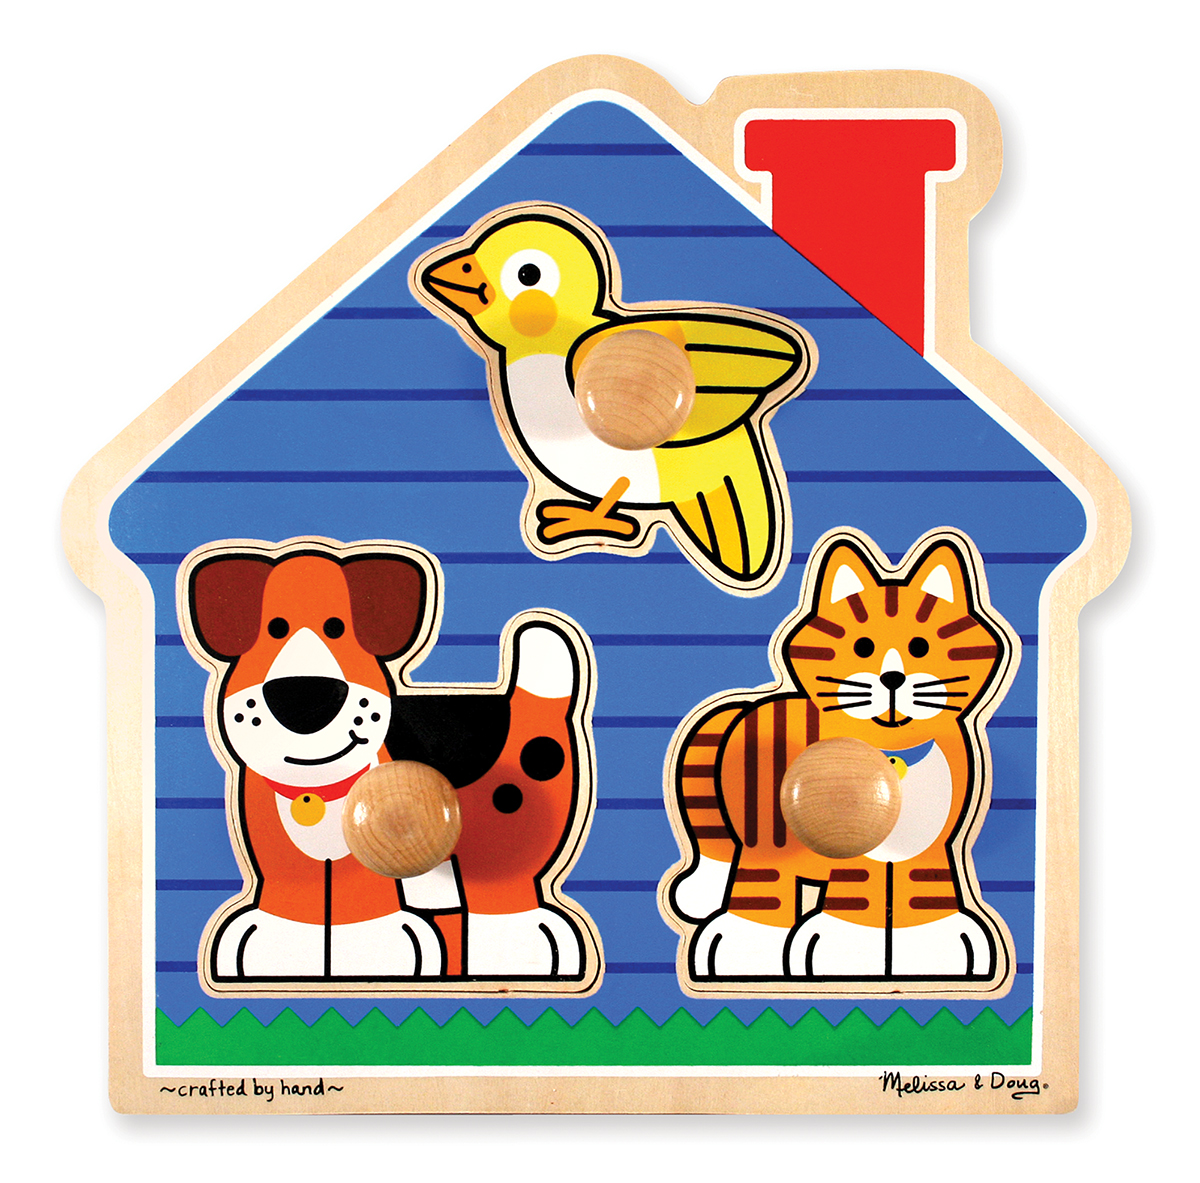 Melissa and Doug House Pets Jumbo Knob Puzzle - 3 Pieces